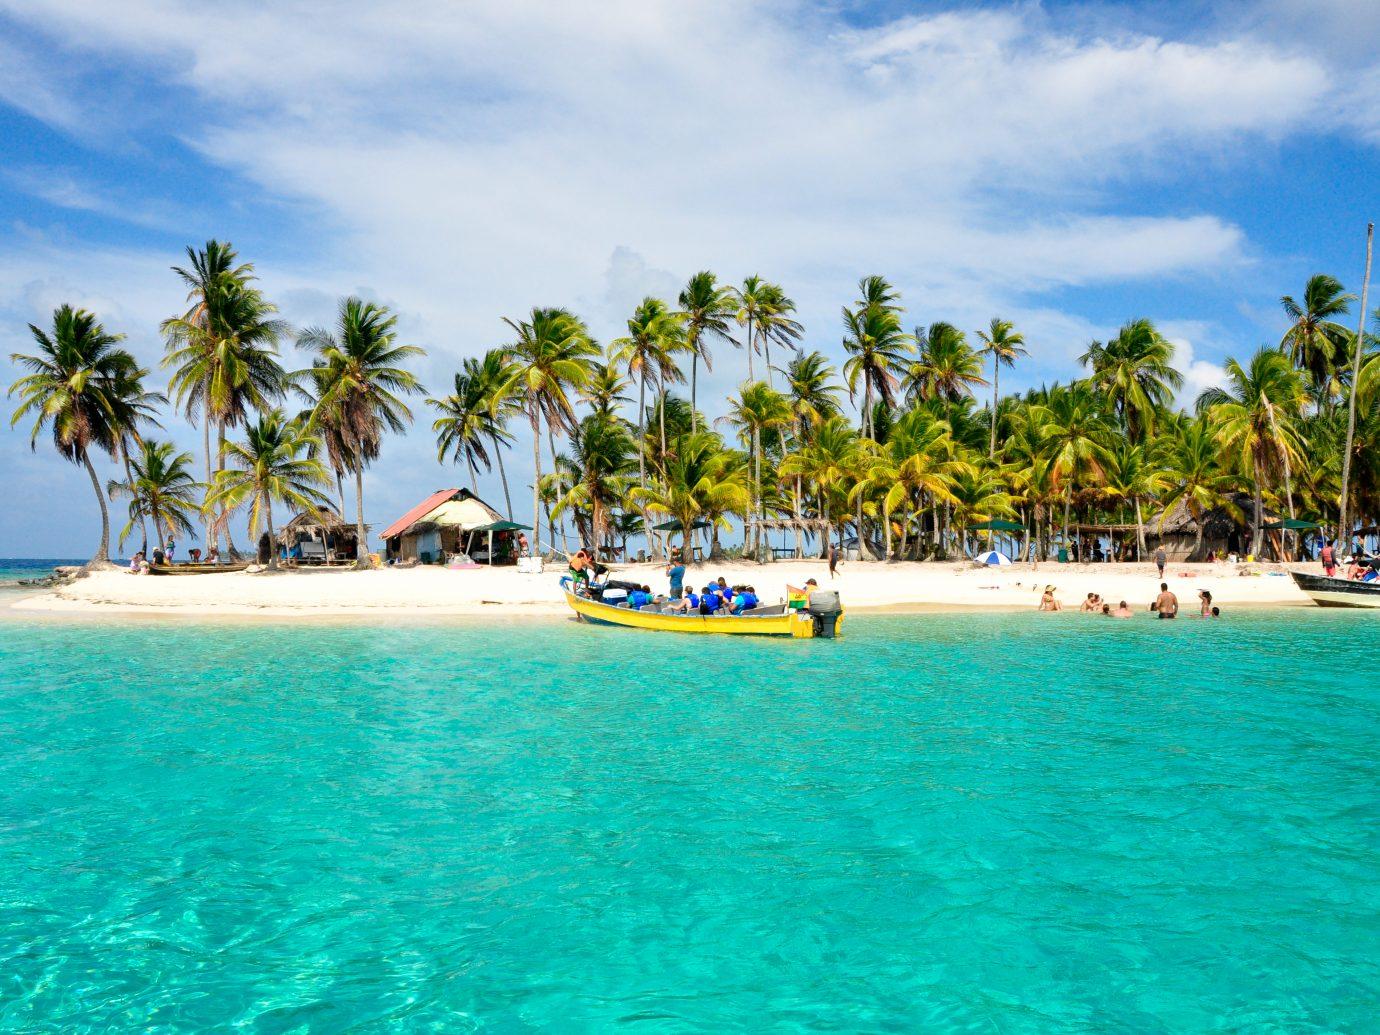 Arraving at a caribbean tropical Island, San Blas, Panama